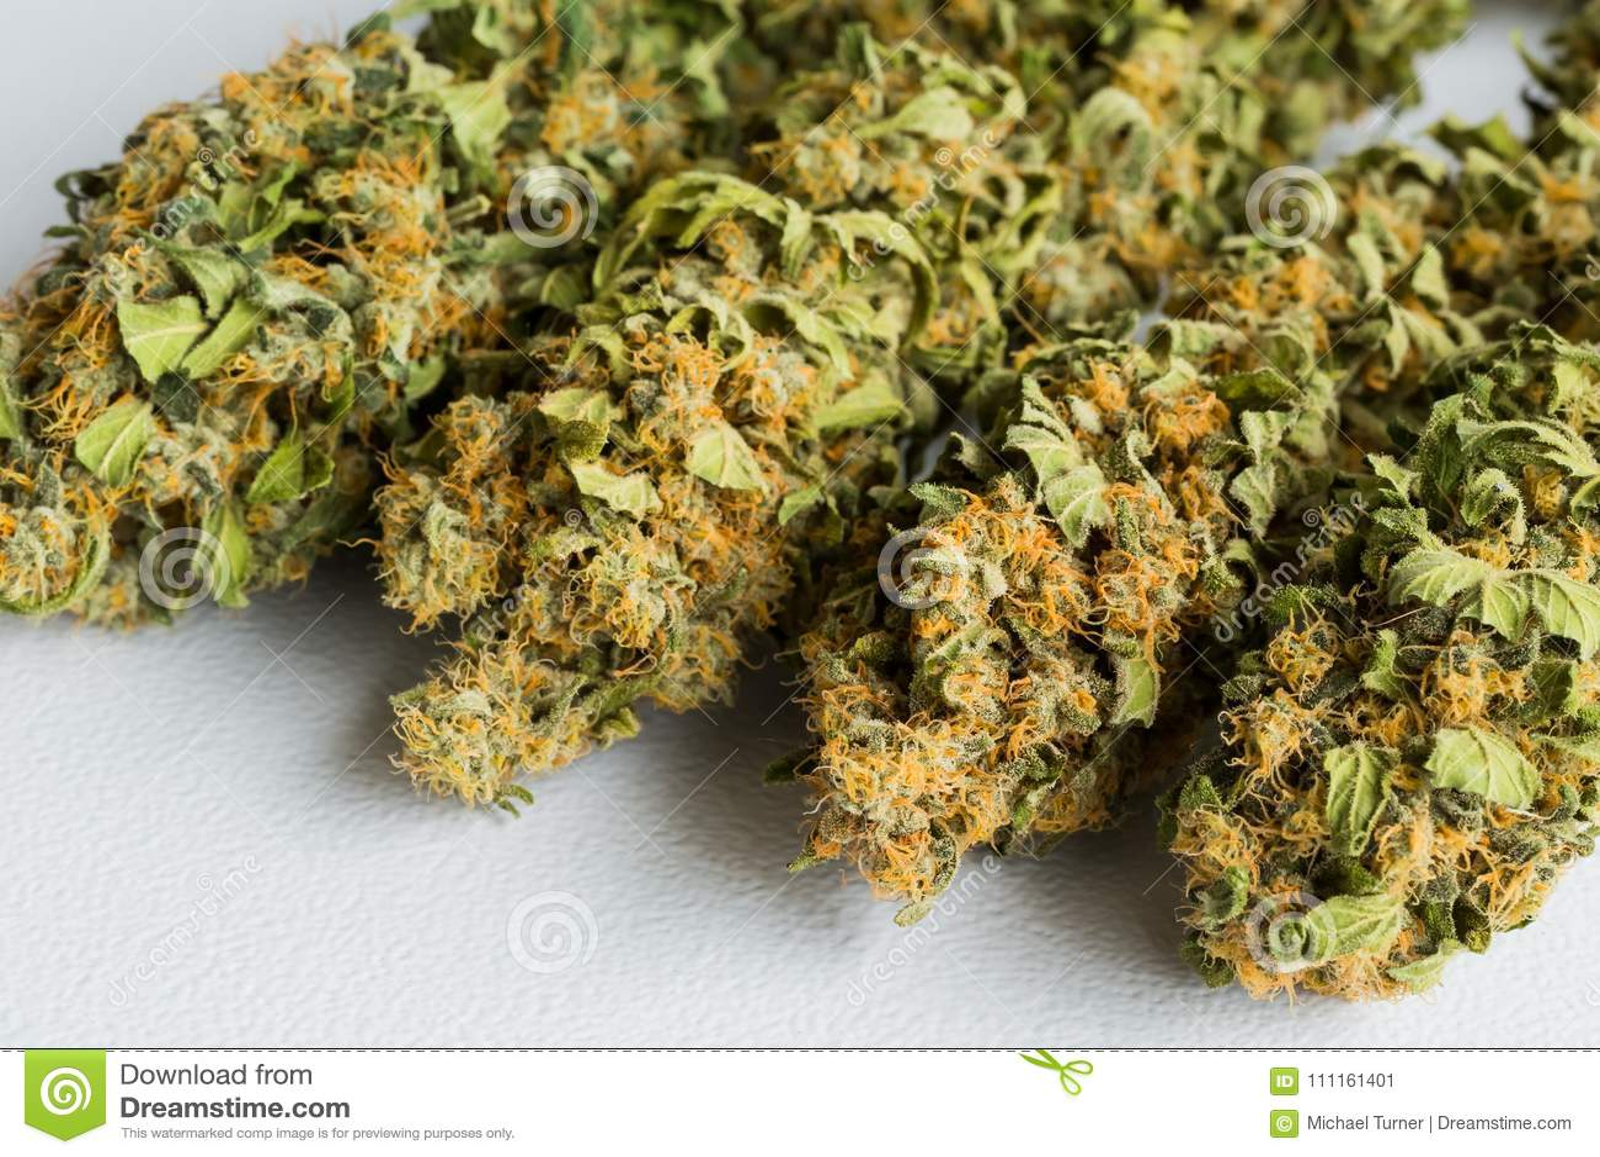 Macro close up of a dried Cannabis Medical Marijuana plant with